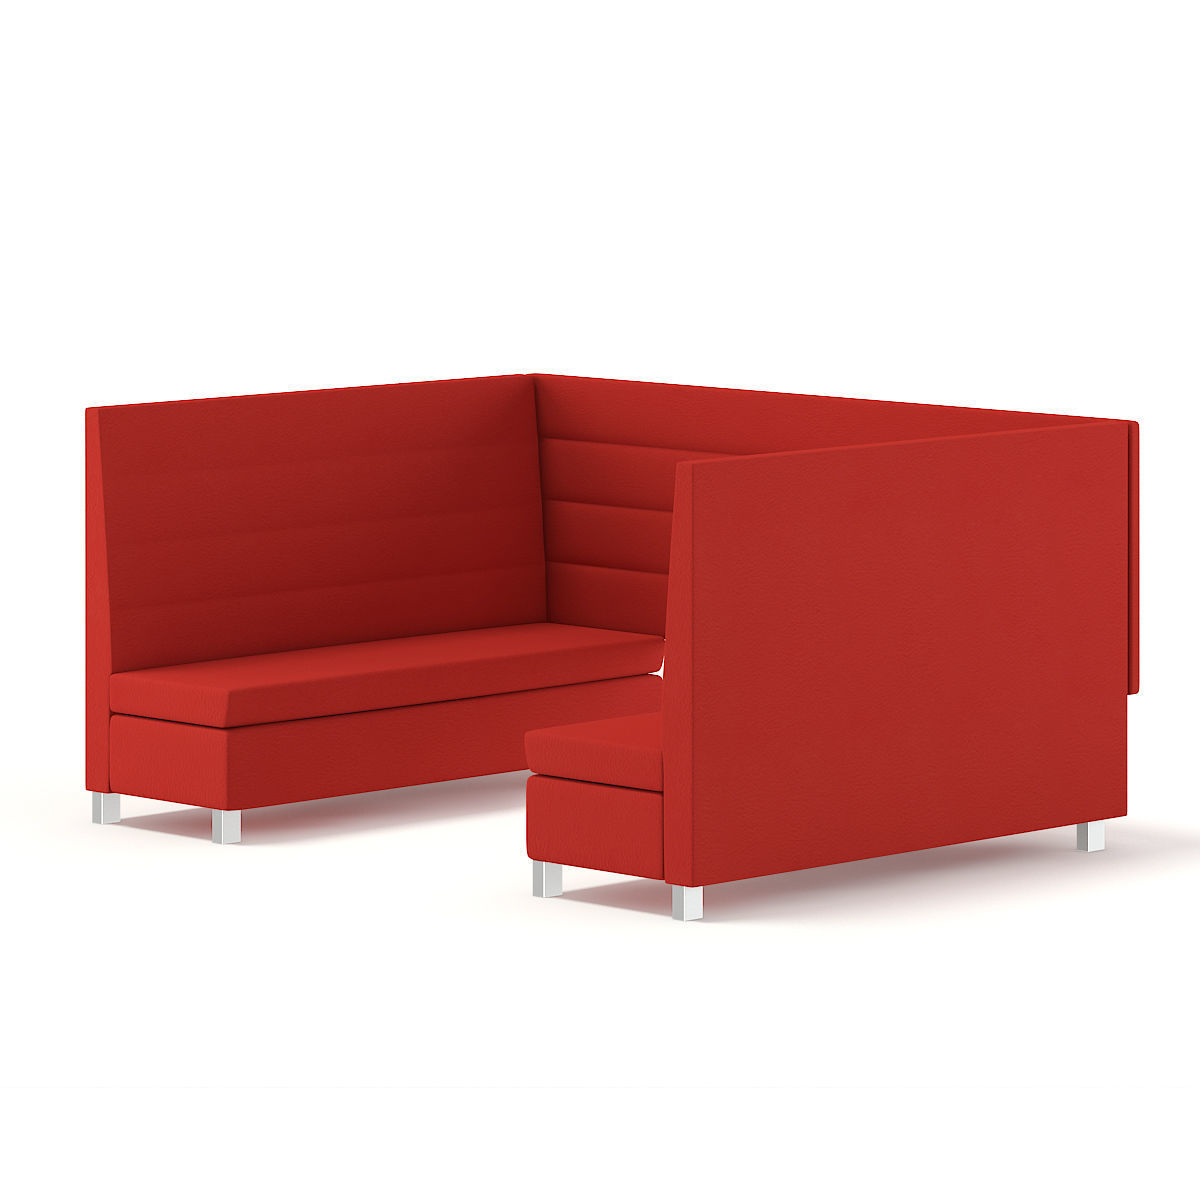 Red Restaurant Sofas Model Max Obj Mtl Fbx C4d 2